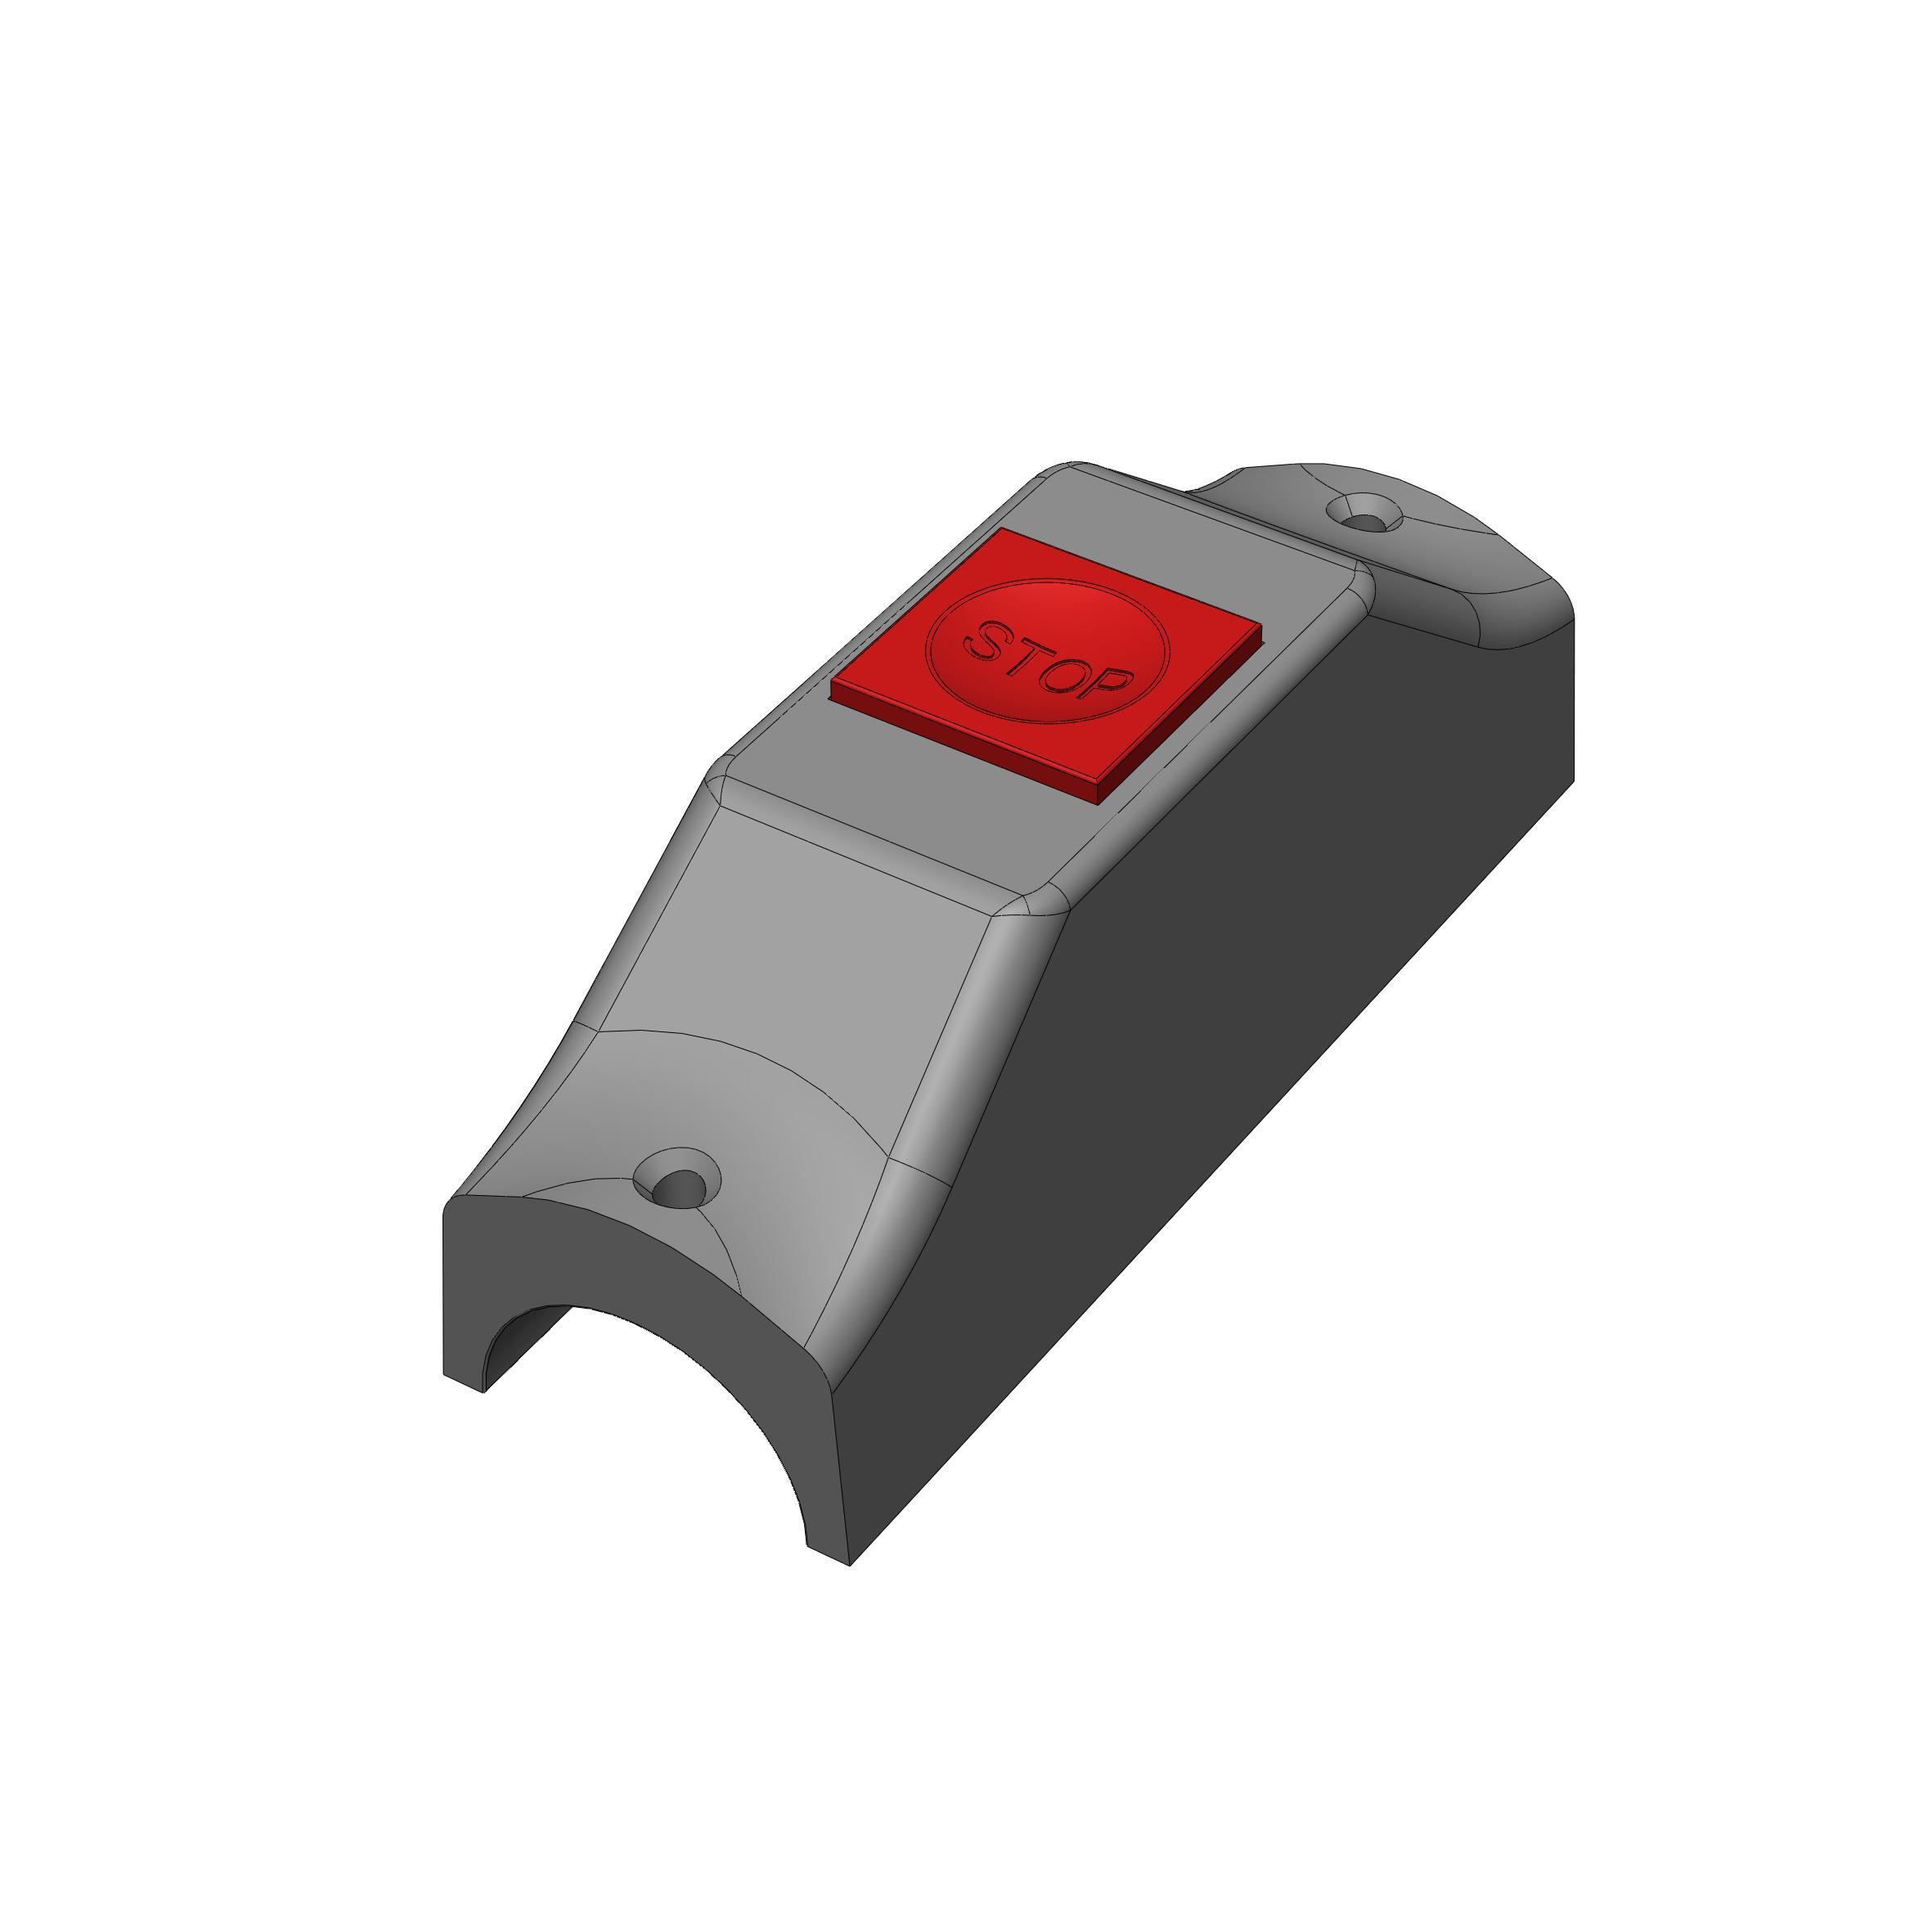 Bell Push - Raised Button - 35mm Rail